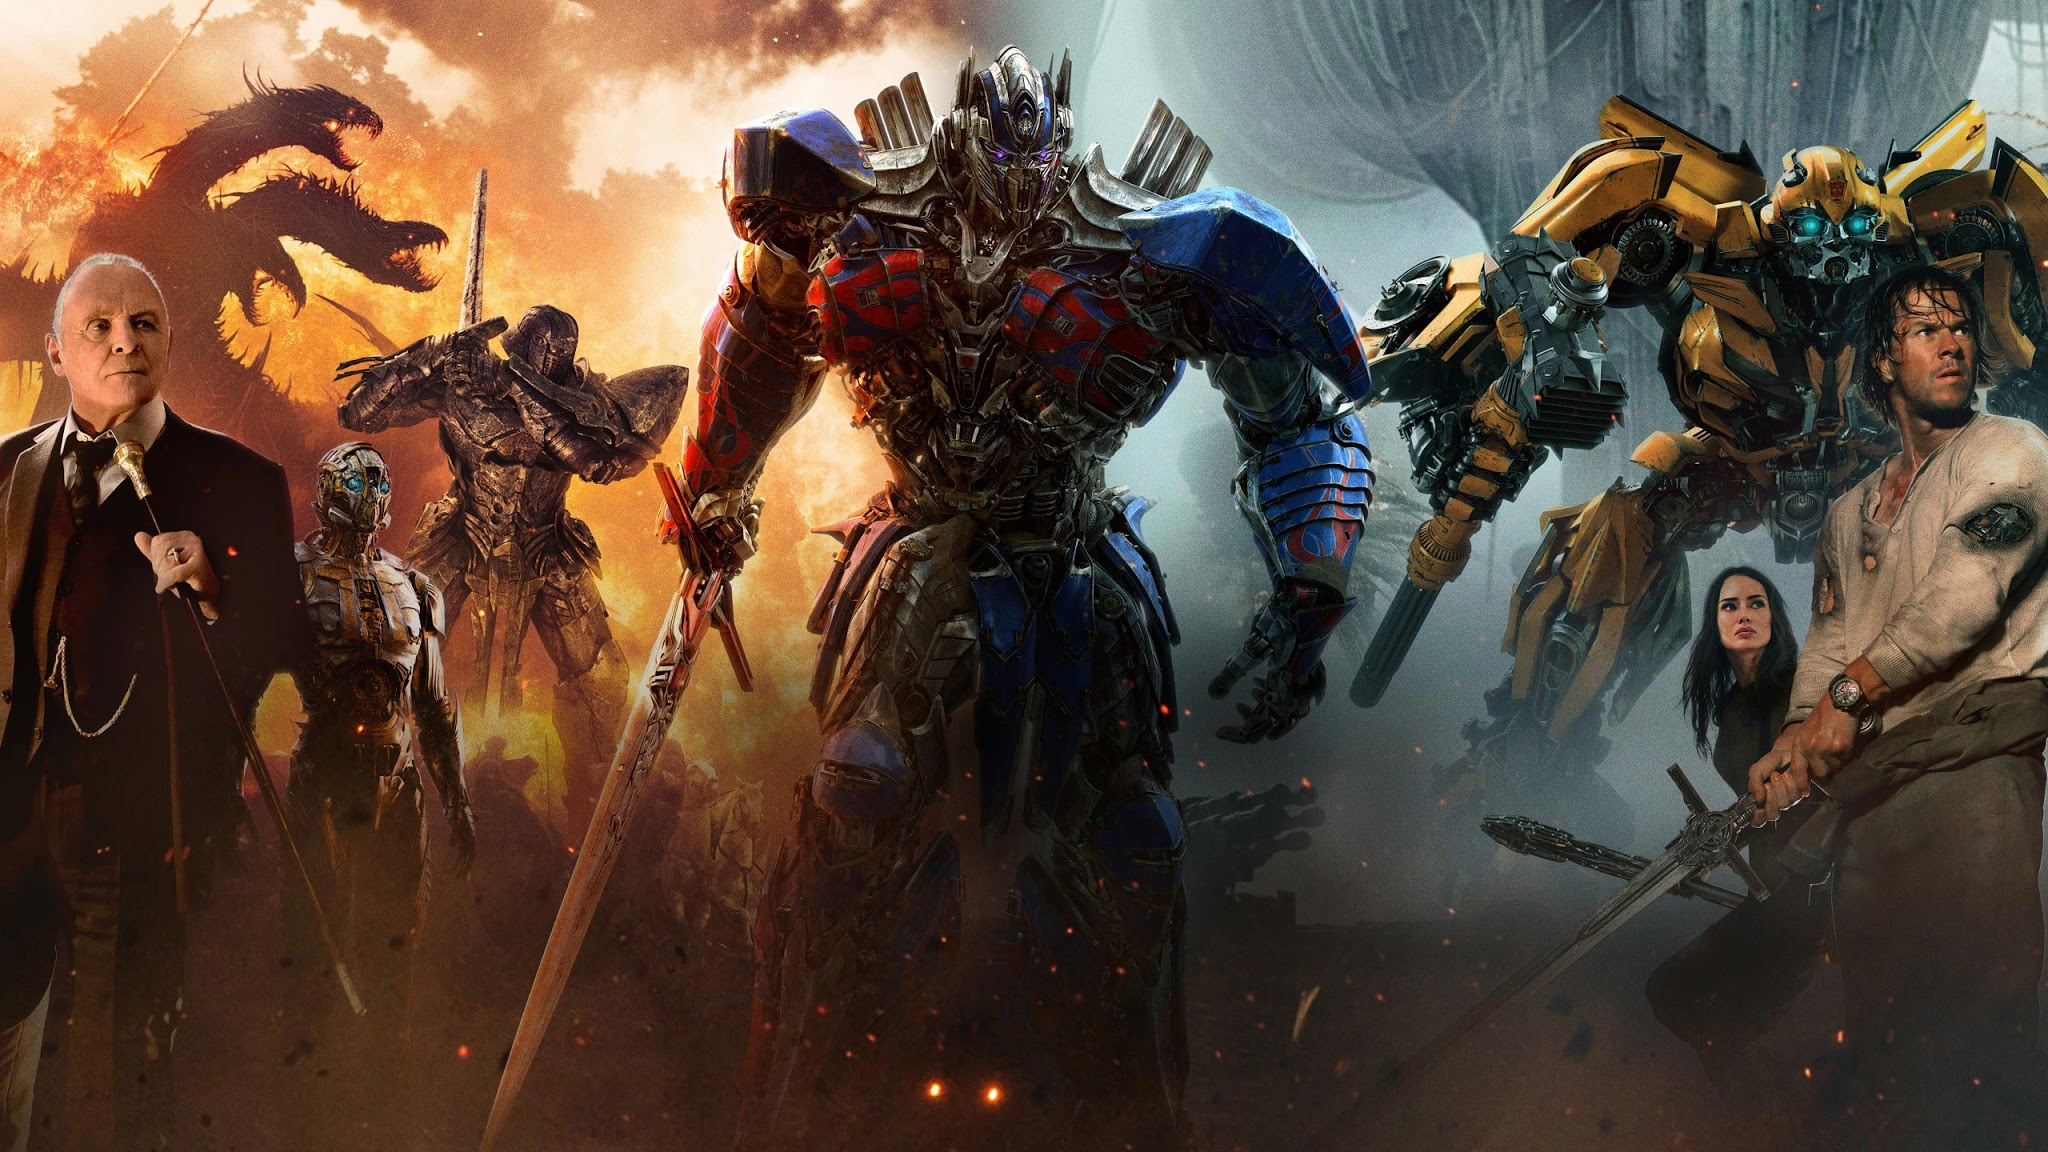 Hd Filme Transformers 5 Stream